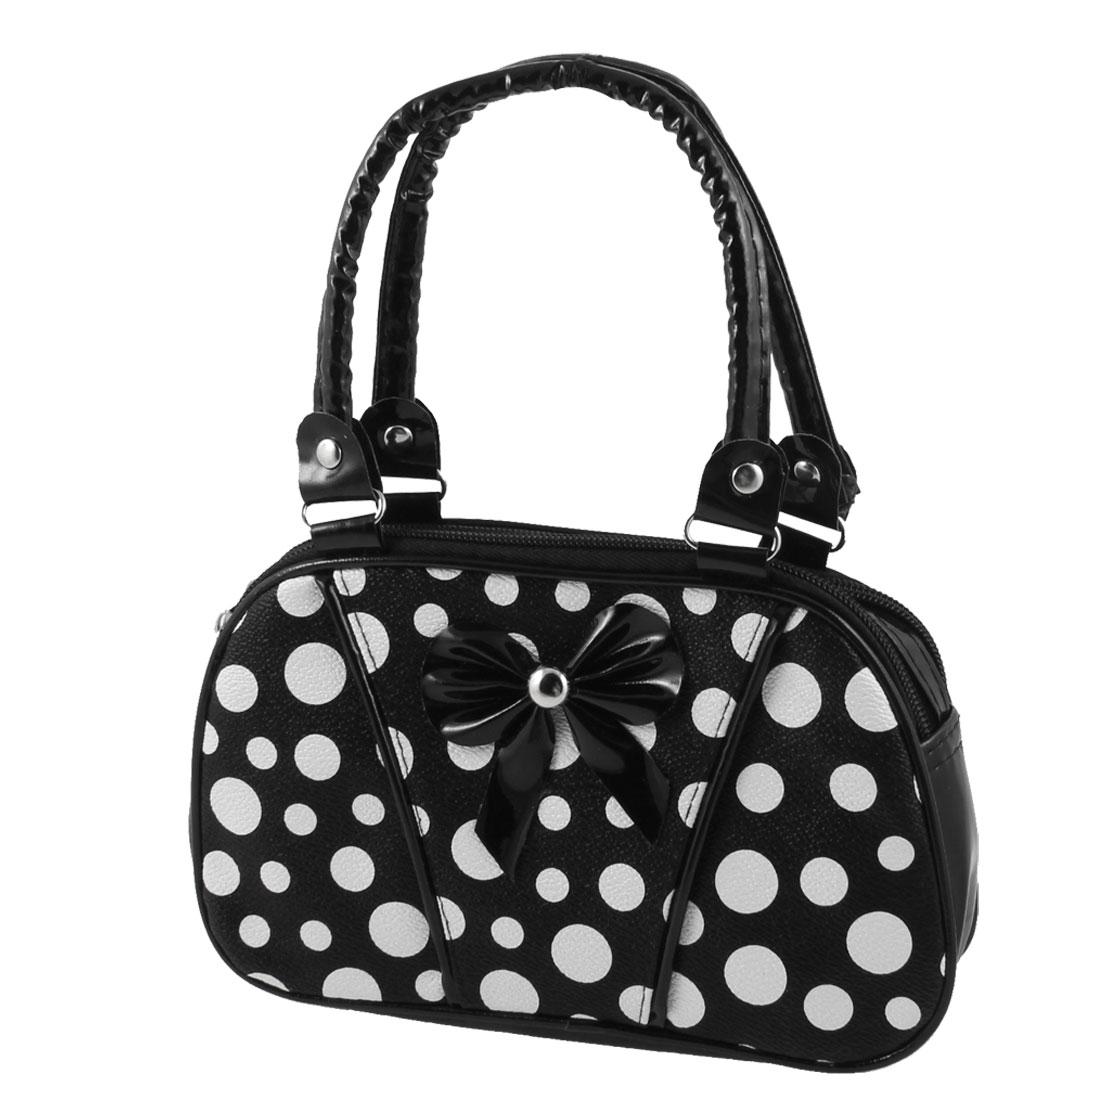 Lady Dot Pattern Black White 2 Compartment Faux Leather Zipper Closure Change Purse Handbag